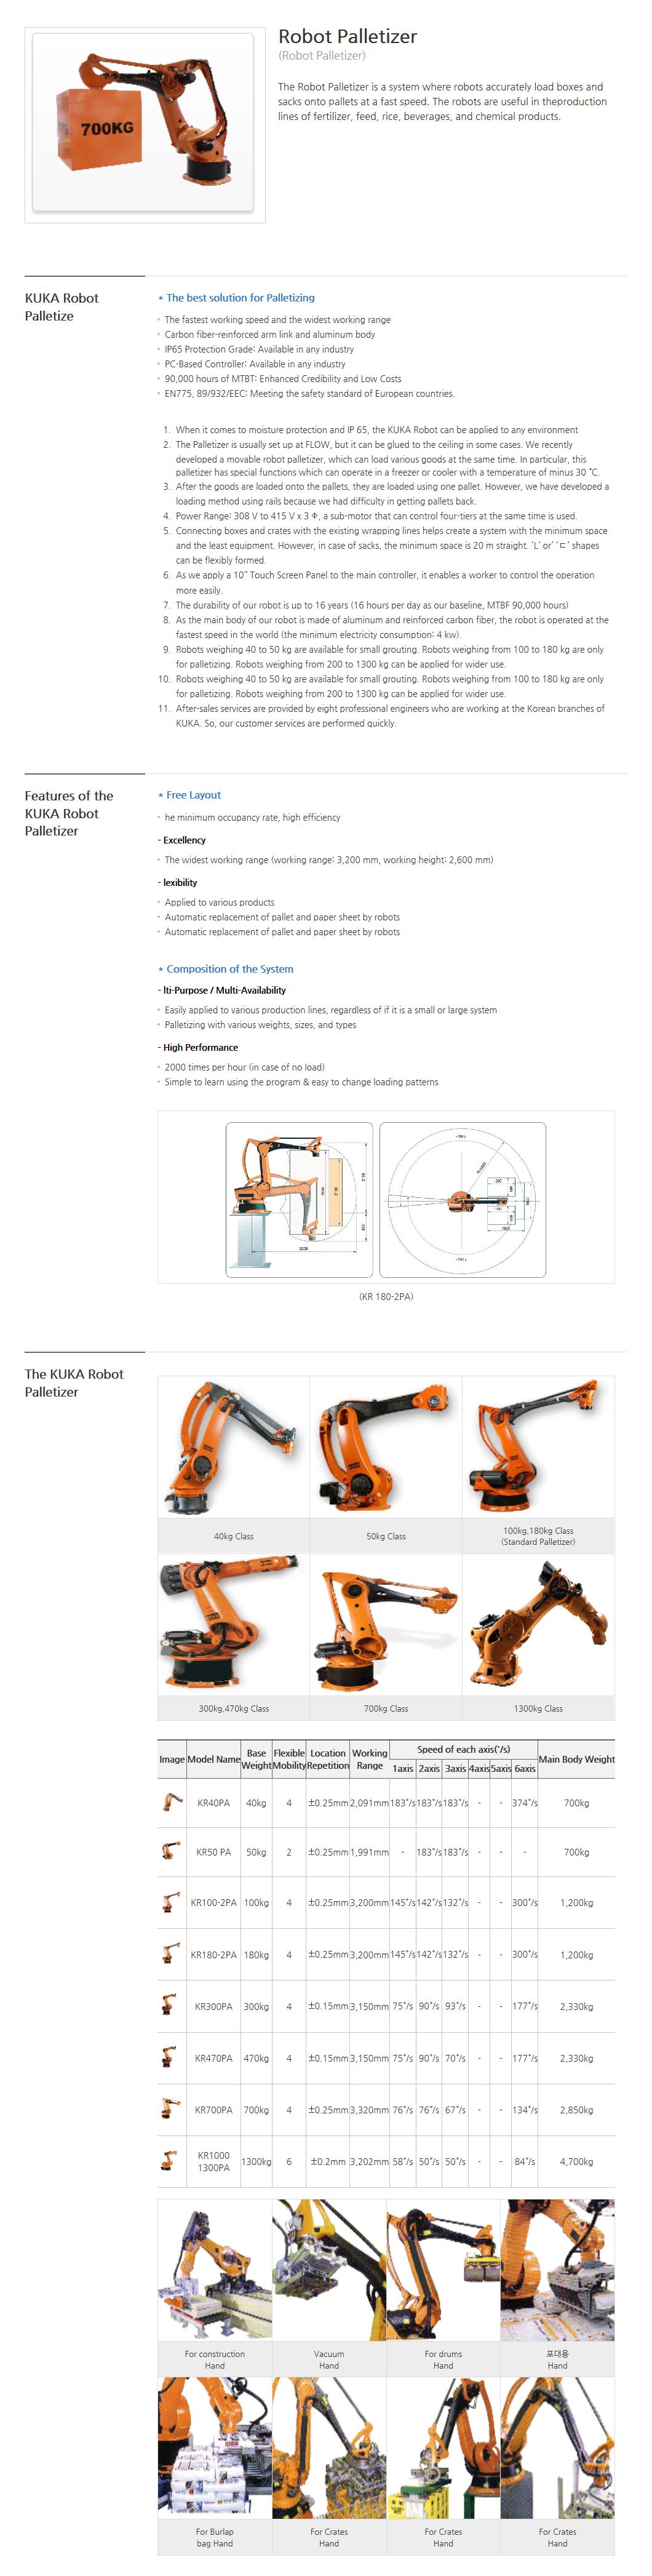 BOWOOSYSTEM Robot Palletizer